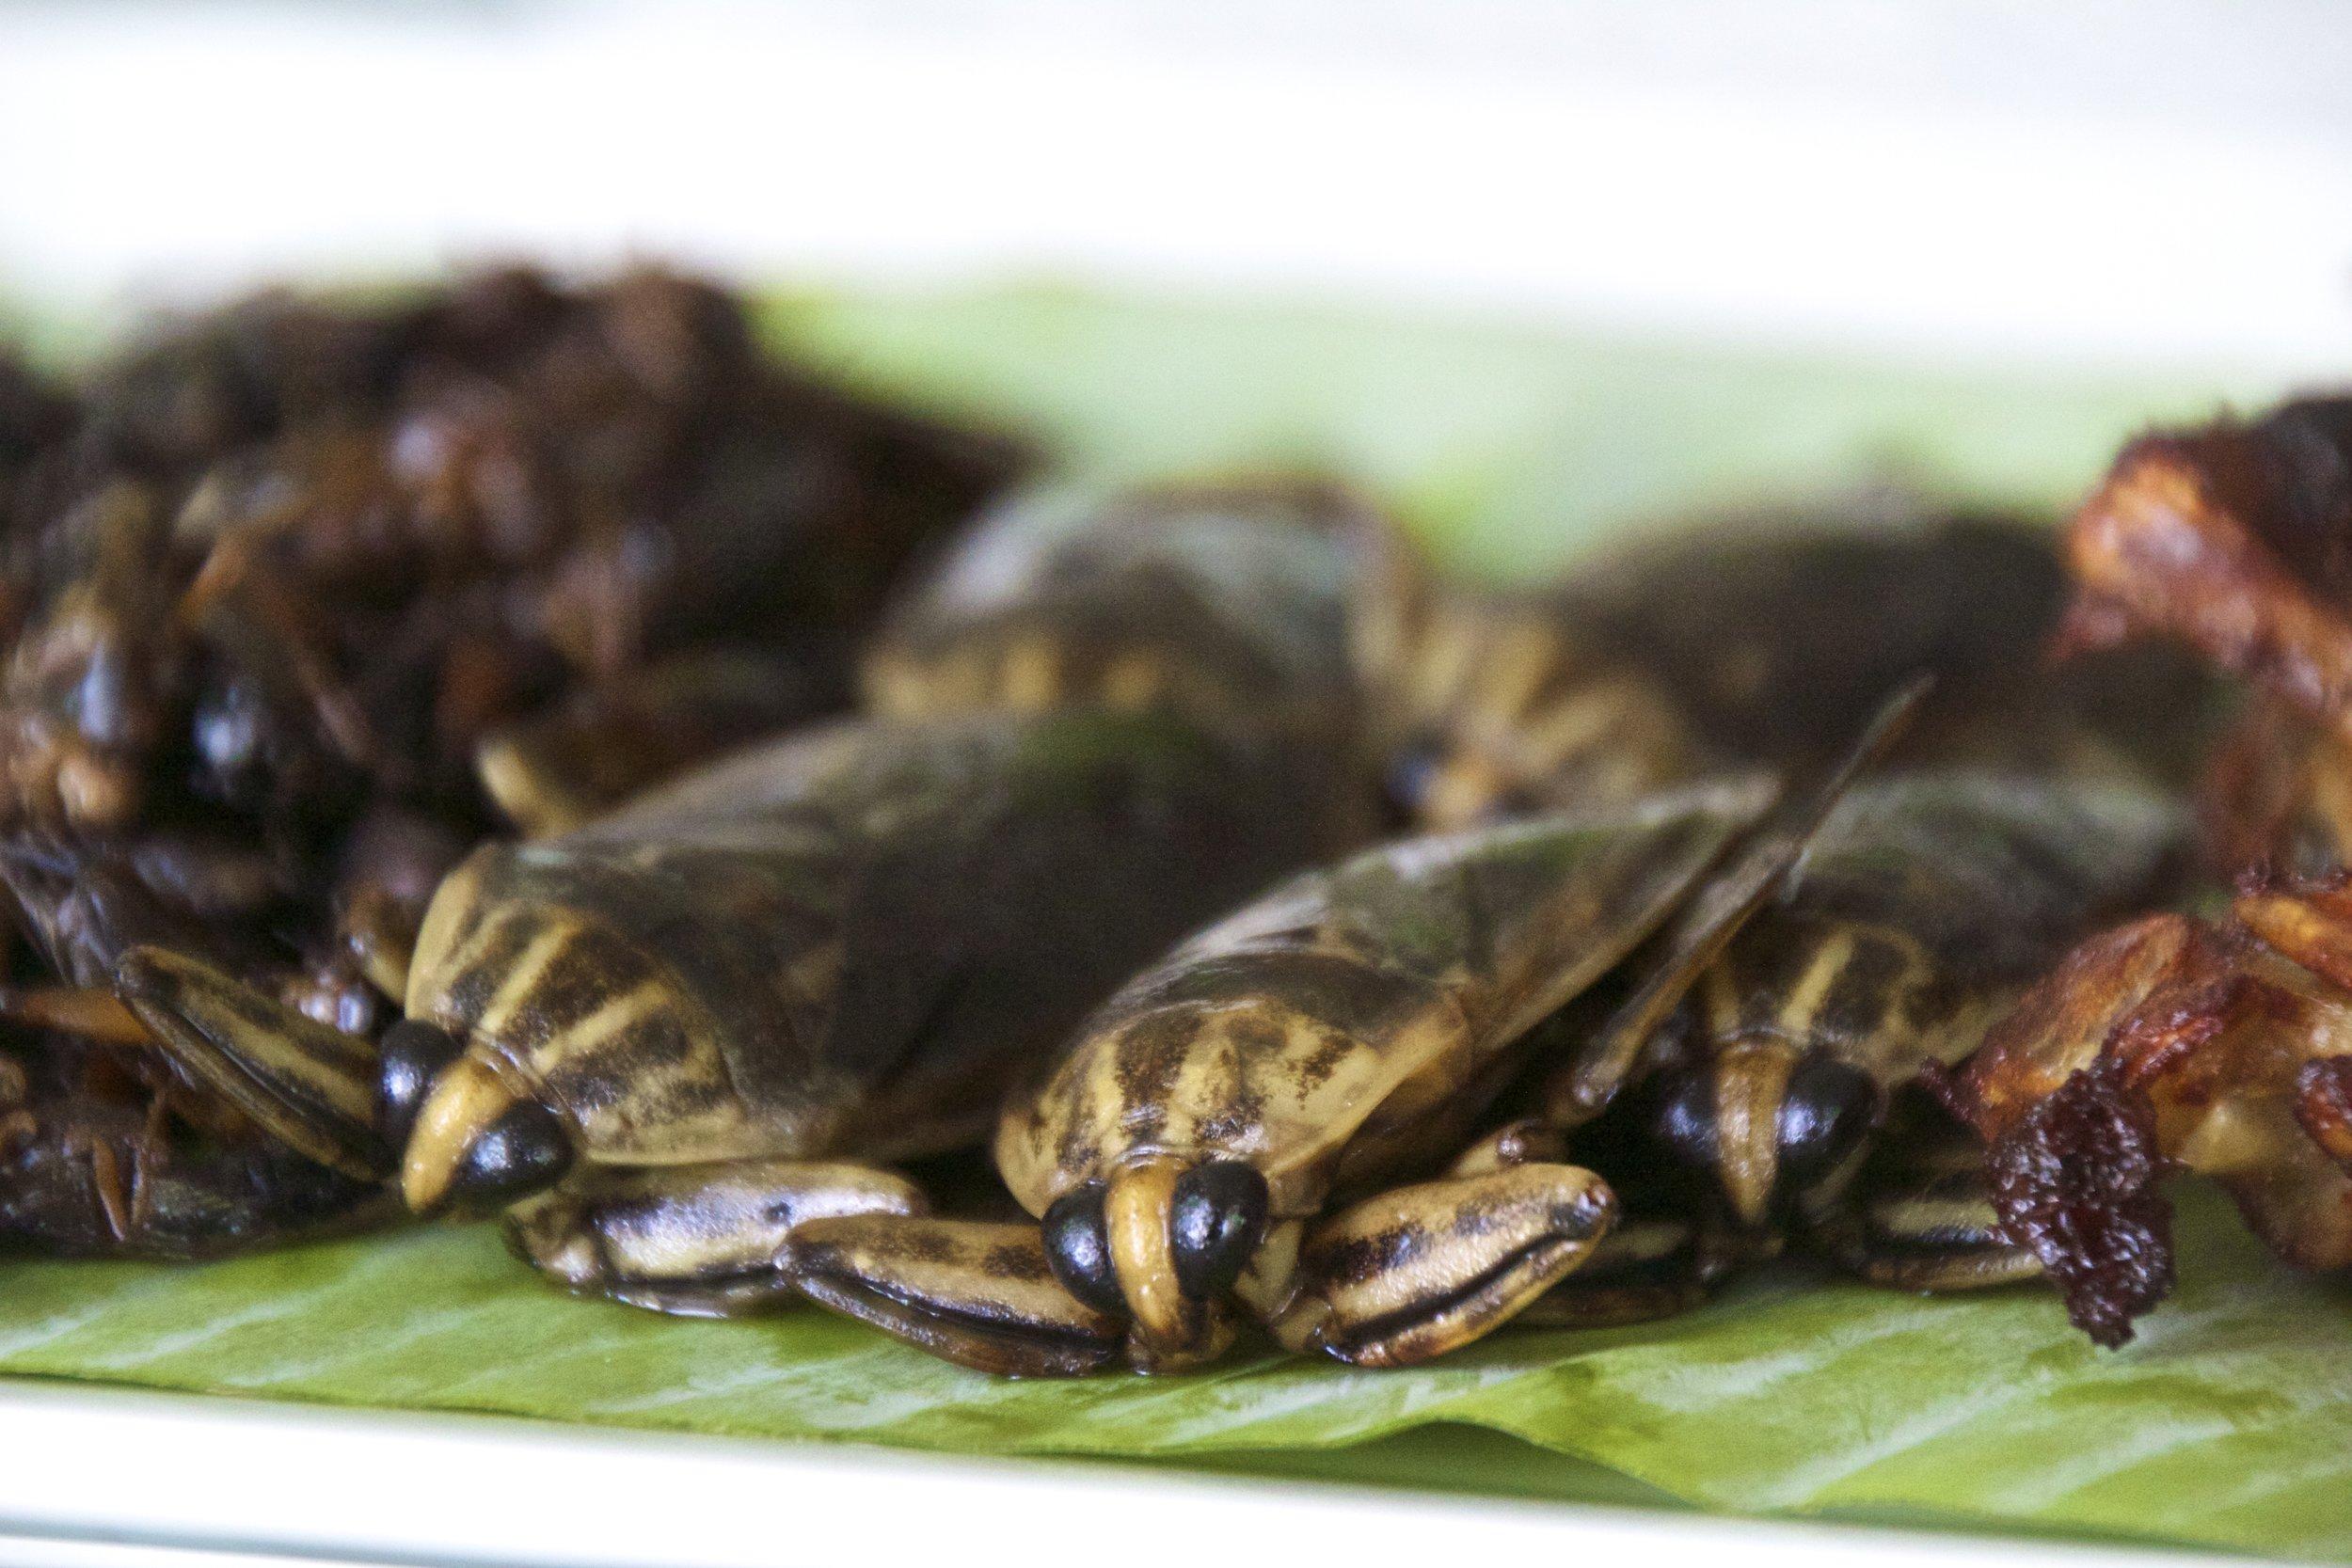 thai food cockroaches horseshoe crabs 2.jpg